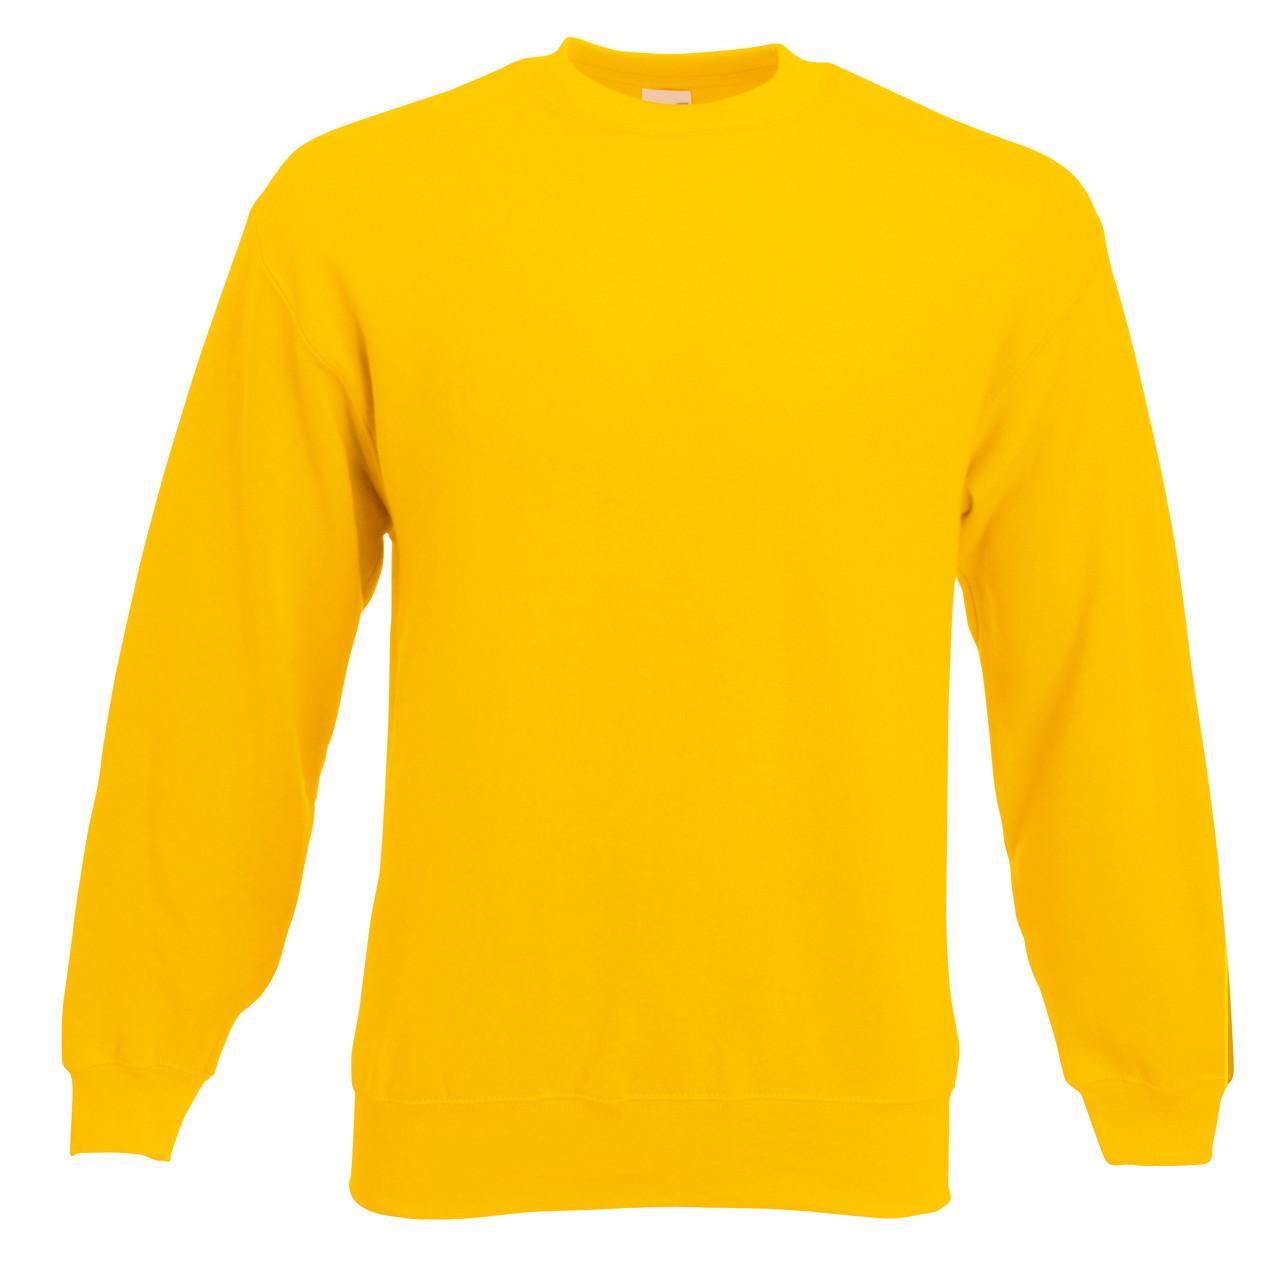 Мужской классический свитер Солнечно-жёлтый Fruit Of The Loom 62-202-34 M